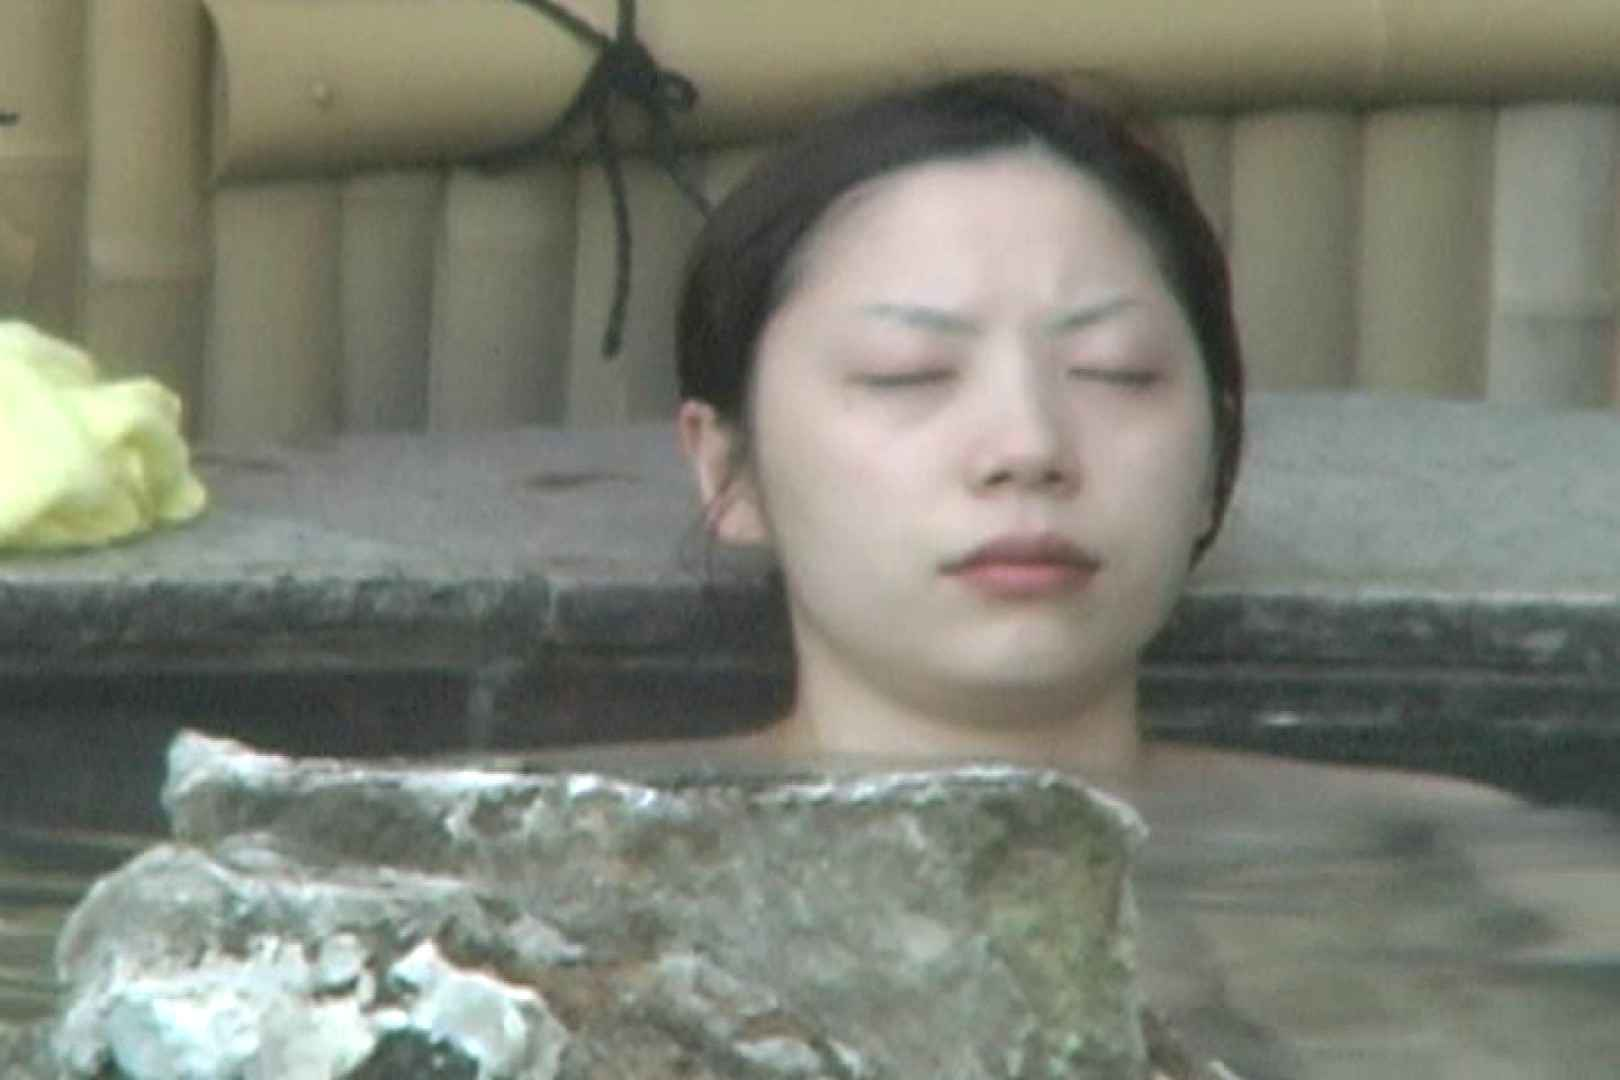 Aquaな露天風呂Vol.596 盗撮シリーズ | 露天風呂編  113PIX 65